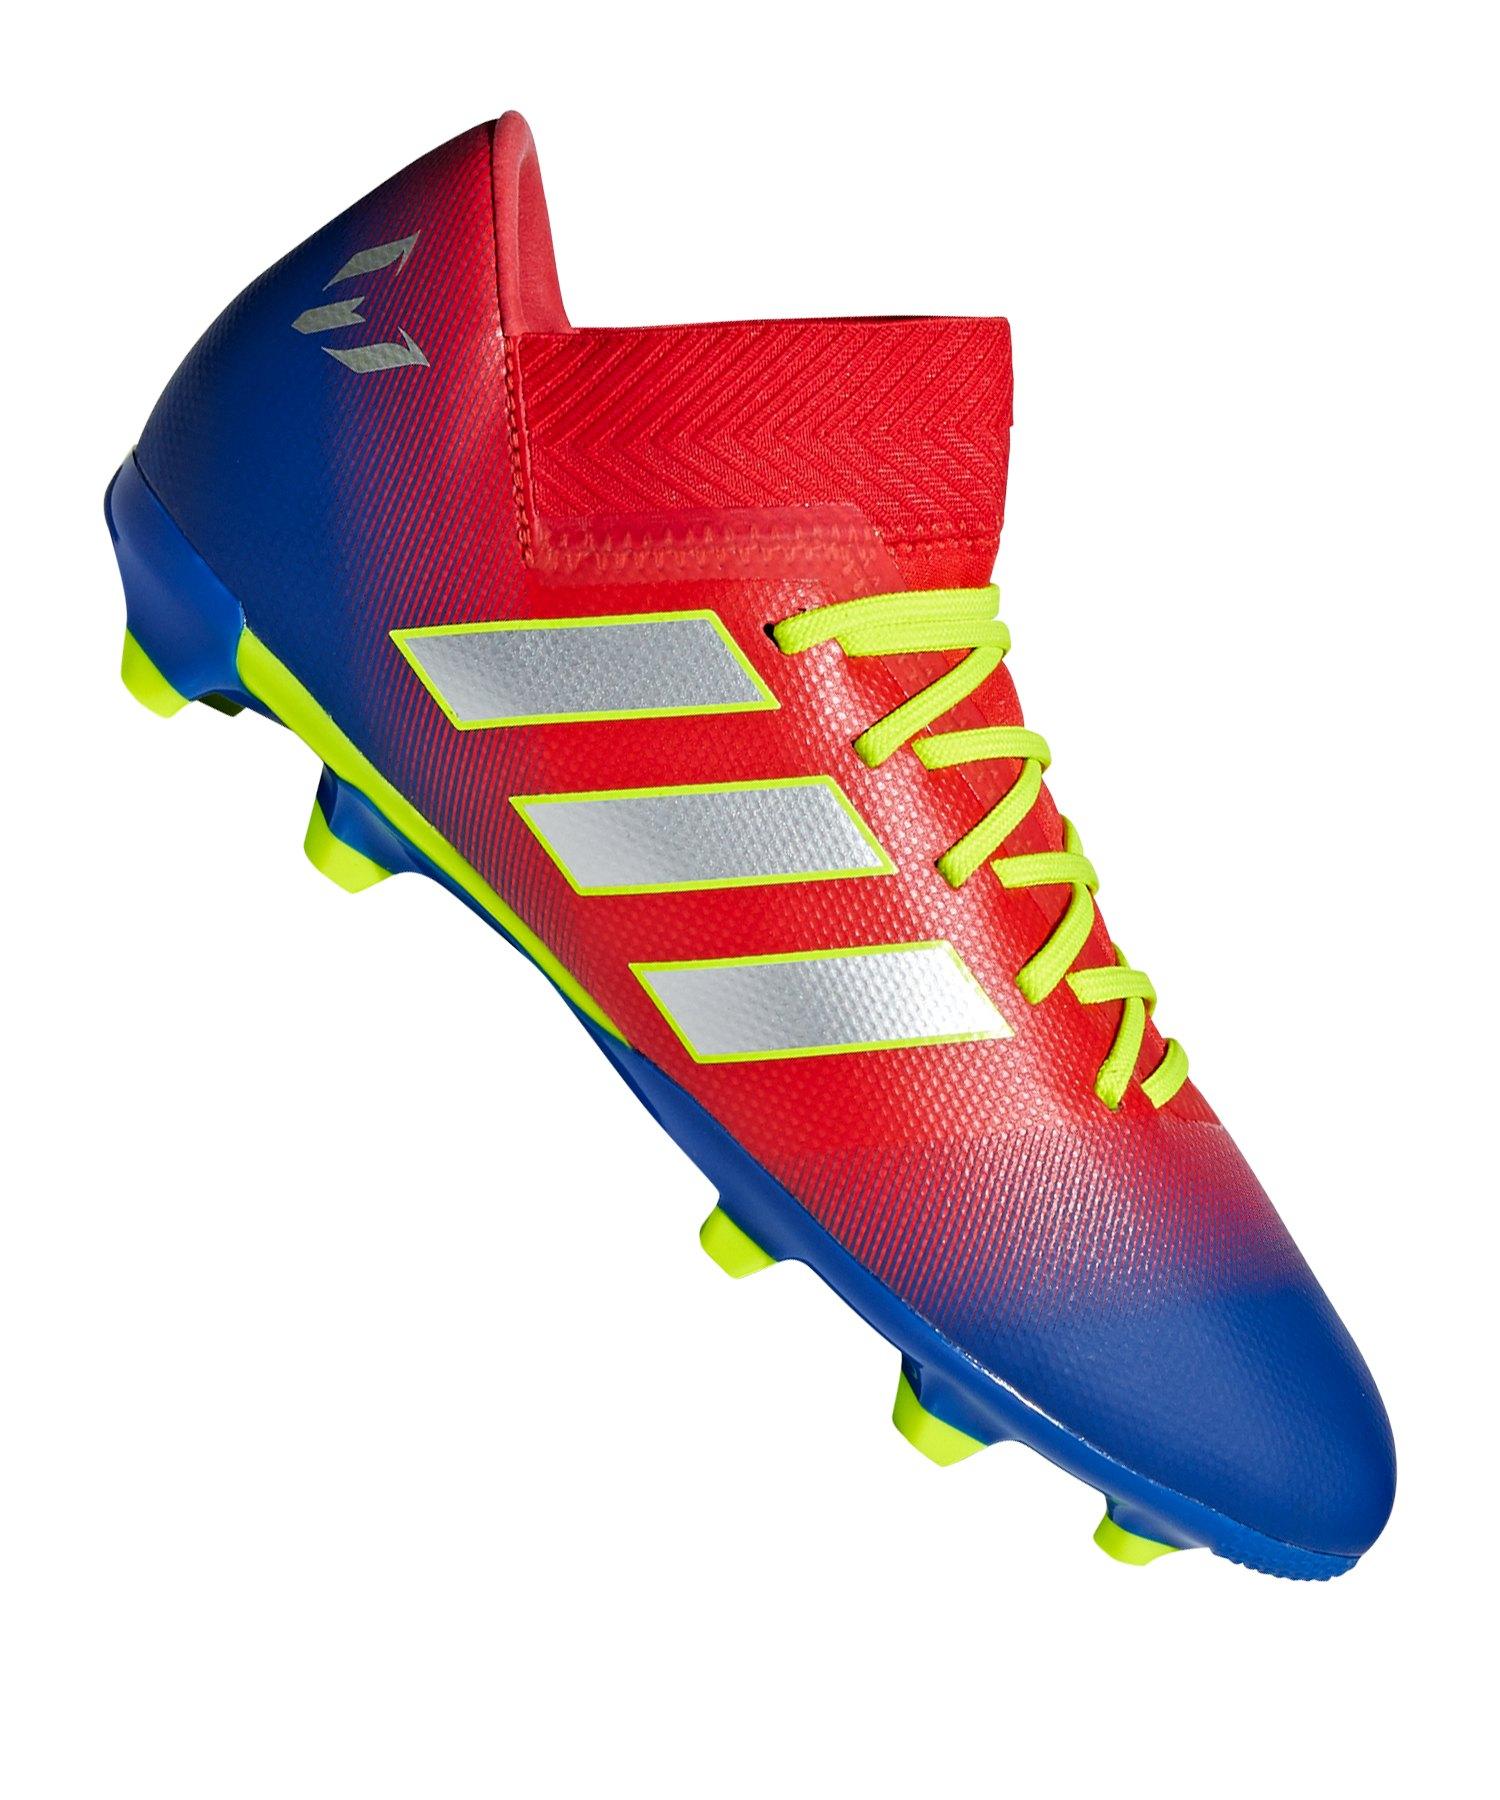 adidas NEMEZIZ Messi 18.3 FG J Kids Rot Blau